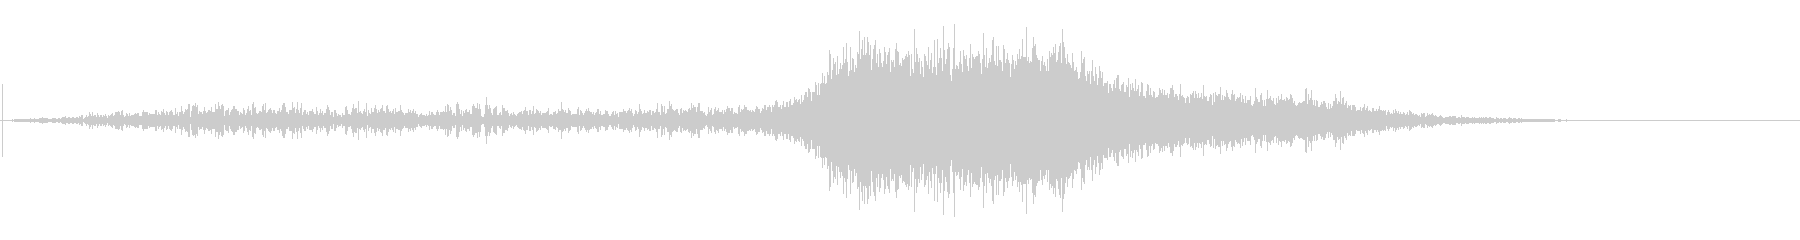 AVEトレインパス1の未再生の波形